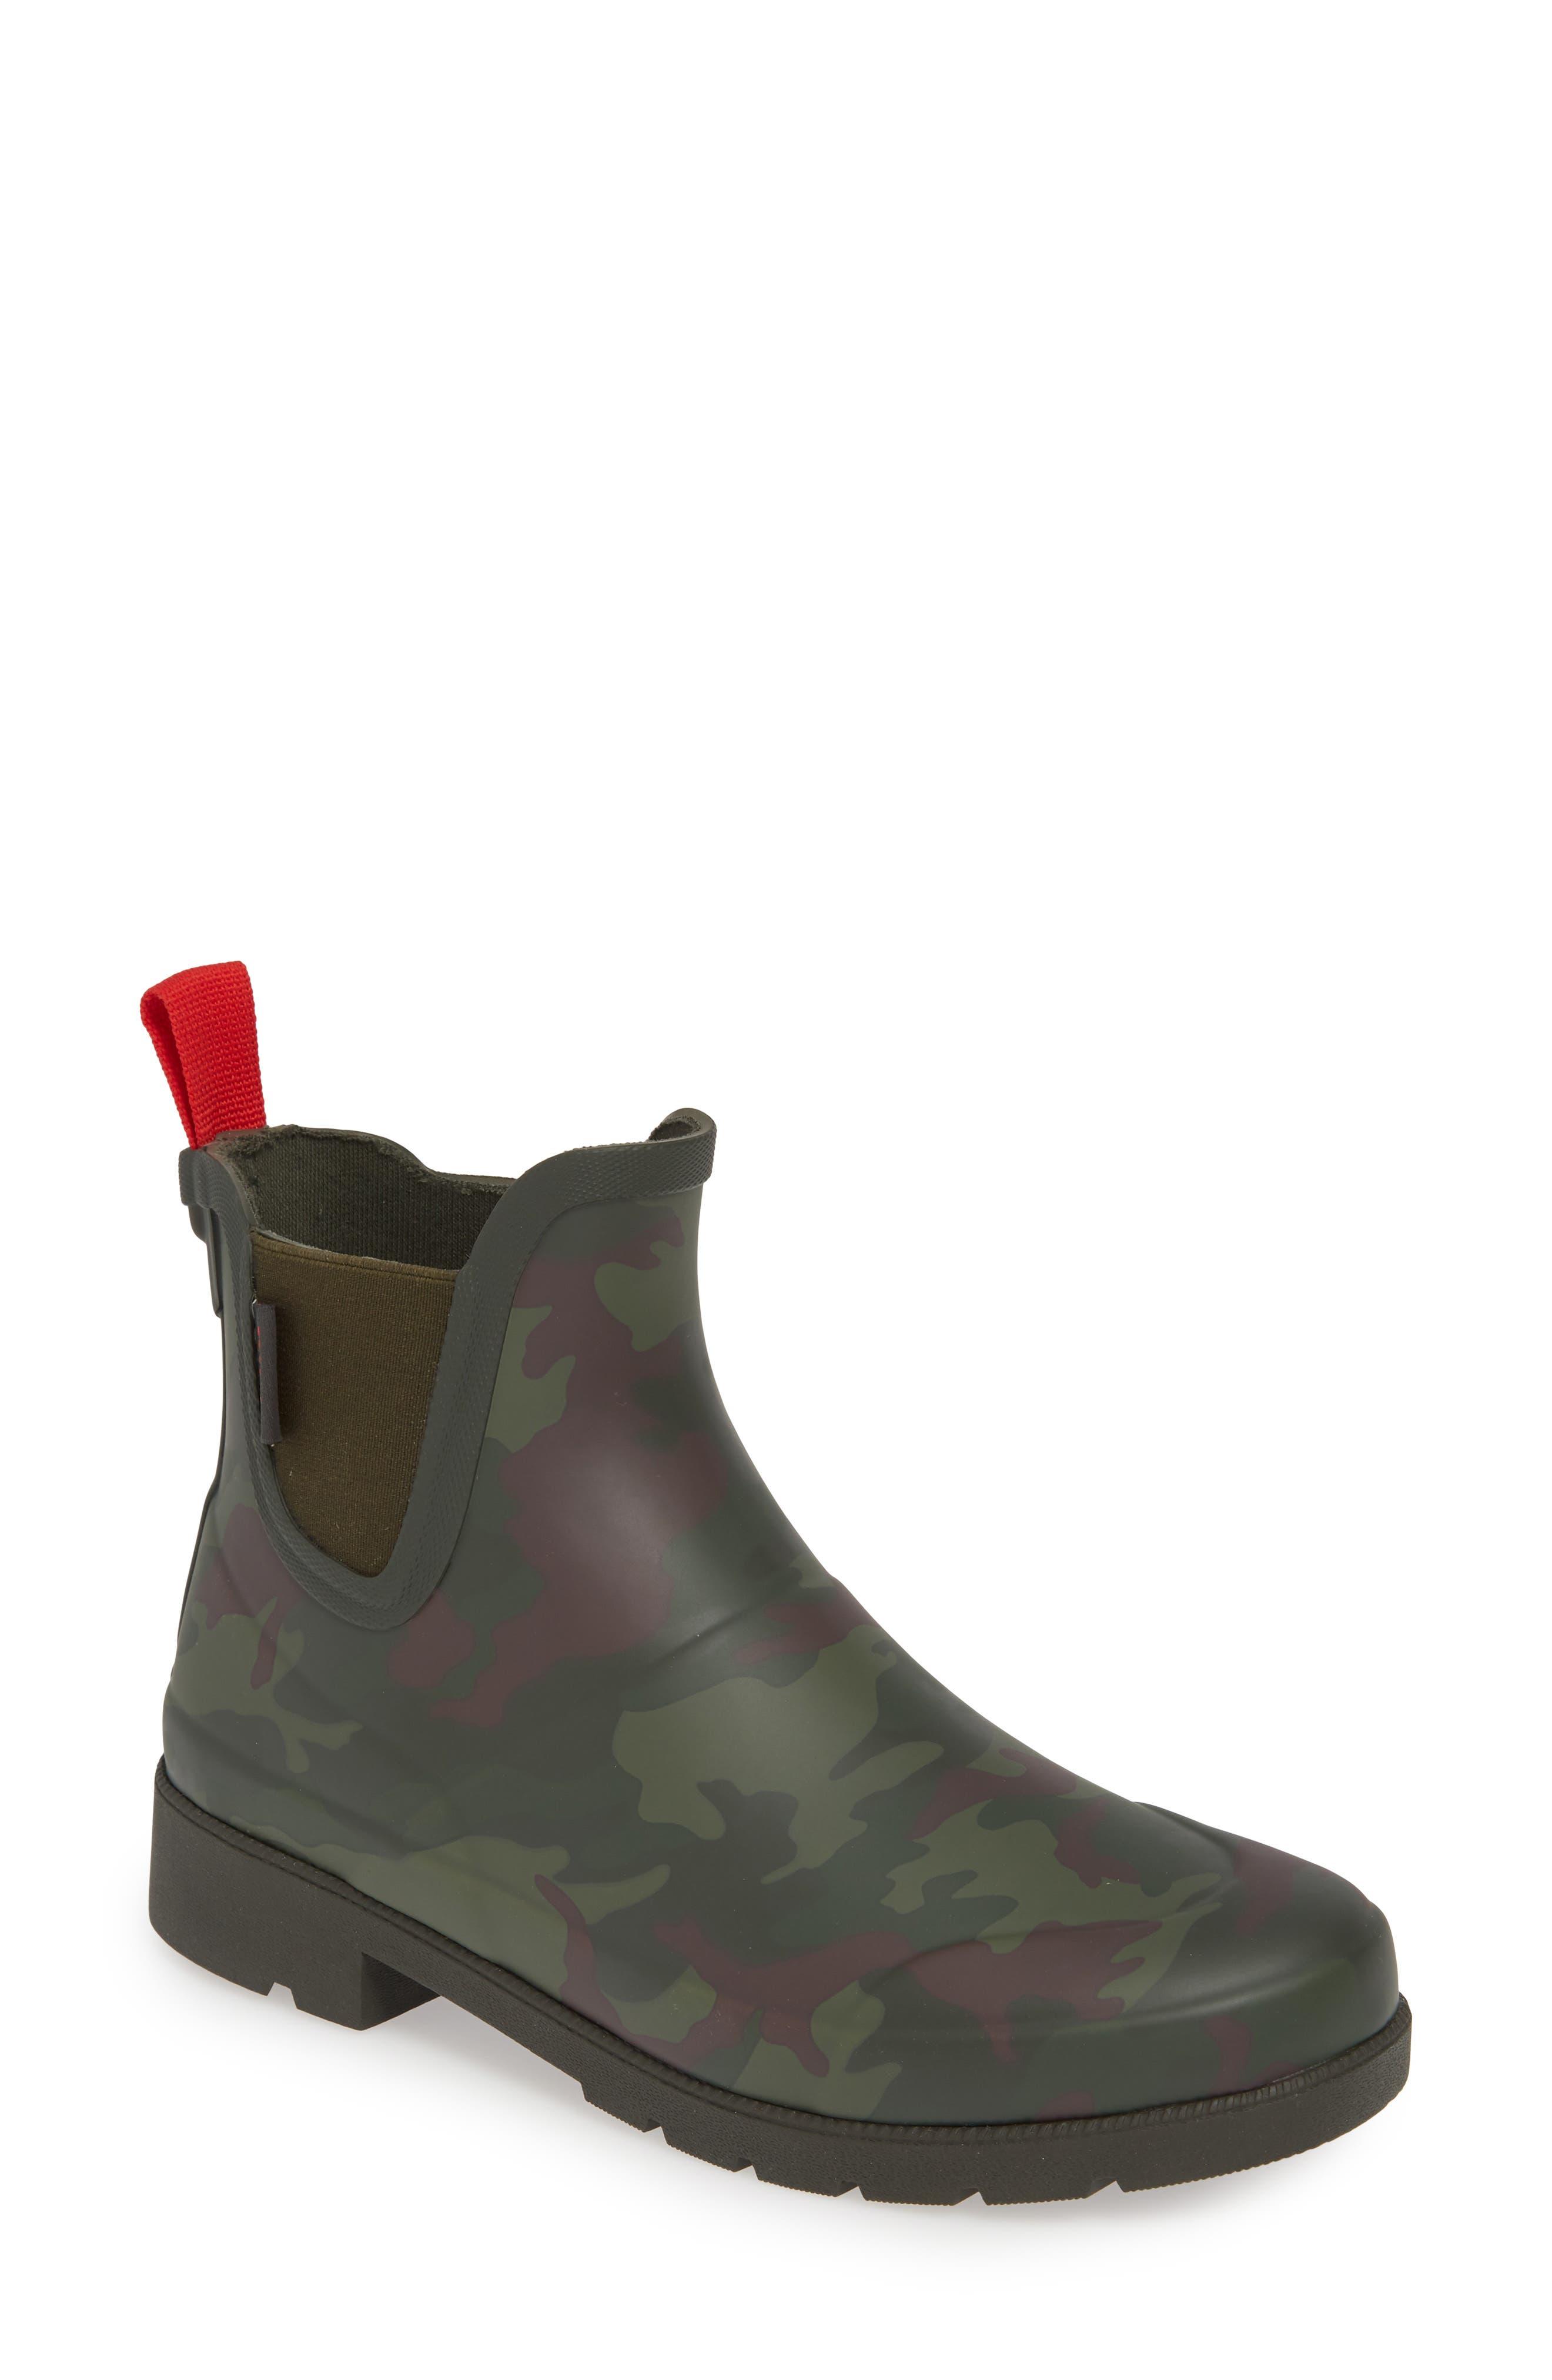 Tretorn Lina 2 Waterproof Chelsea Rain Boot, Green